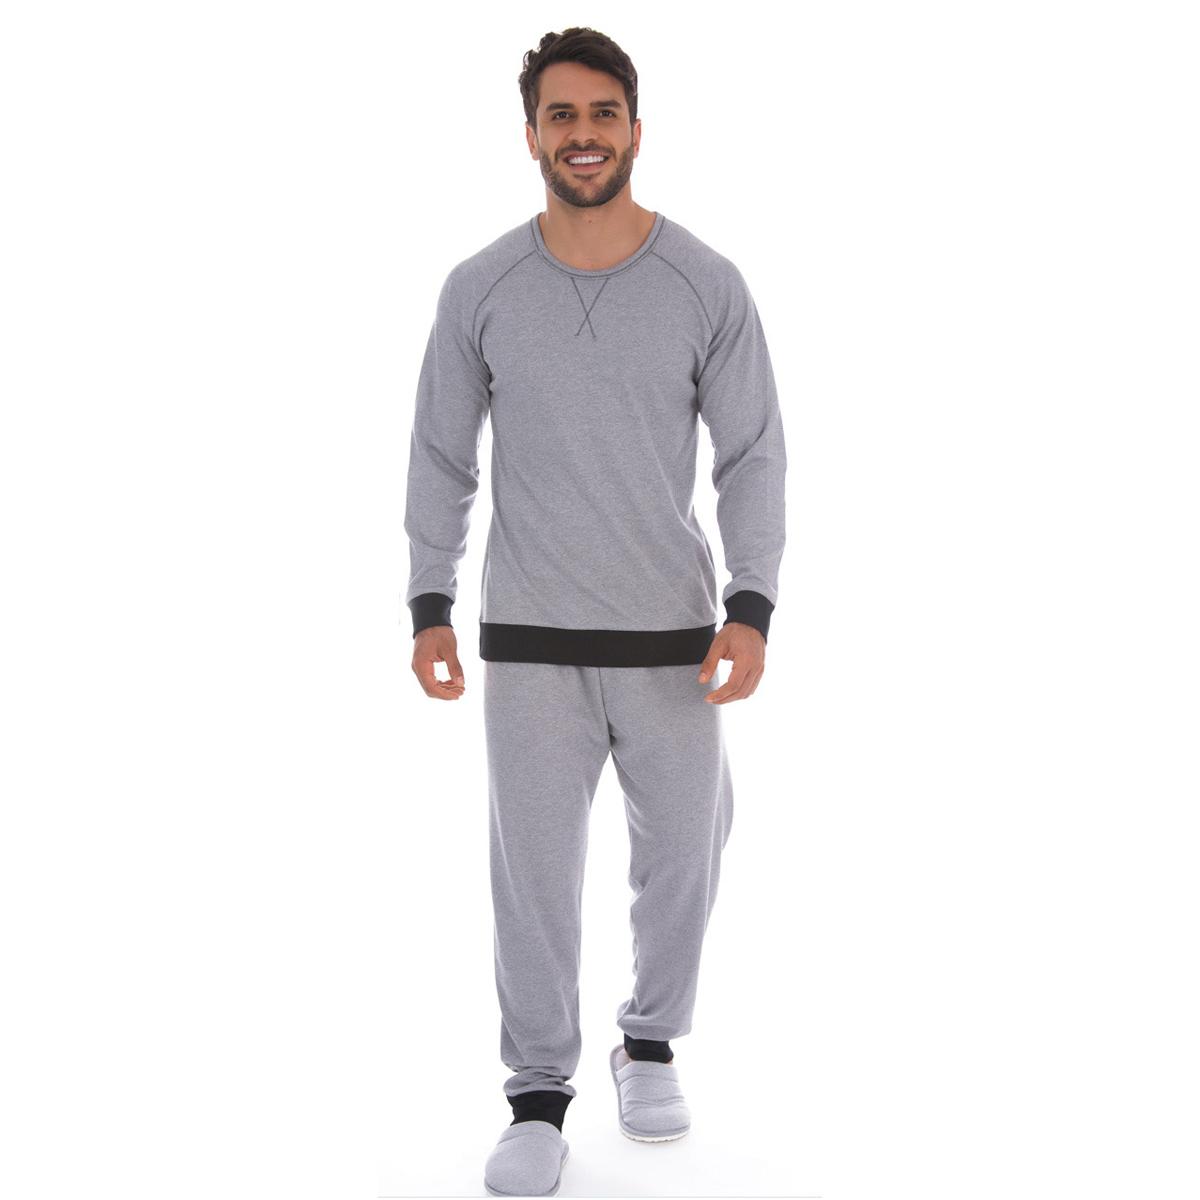 Pijama masculino para o inverno ESTILO Victory